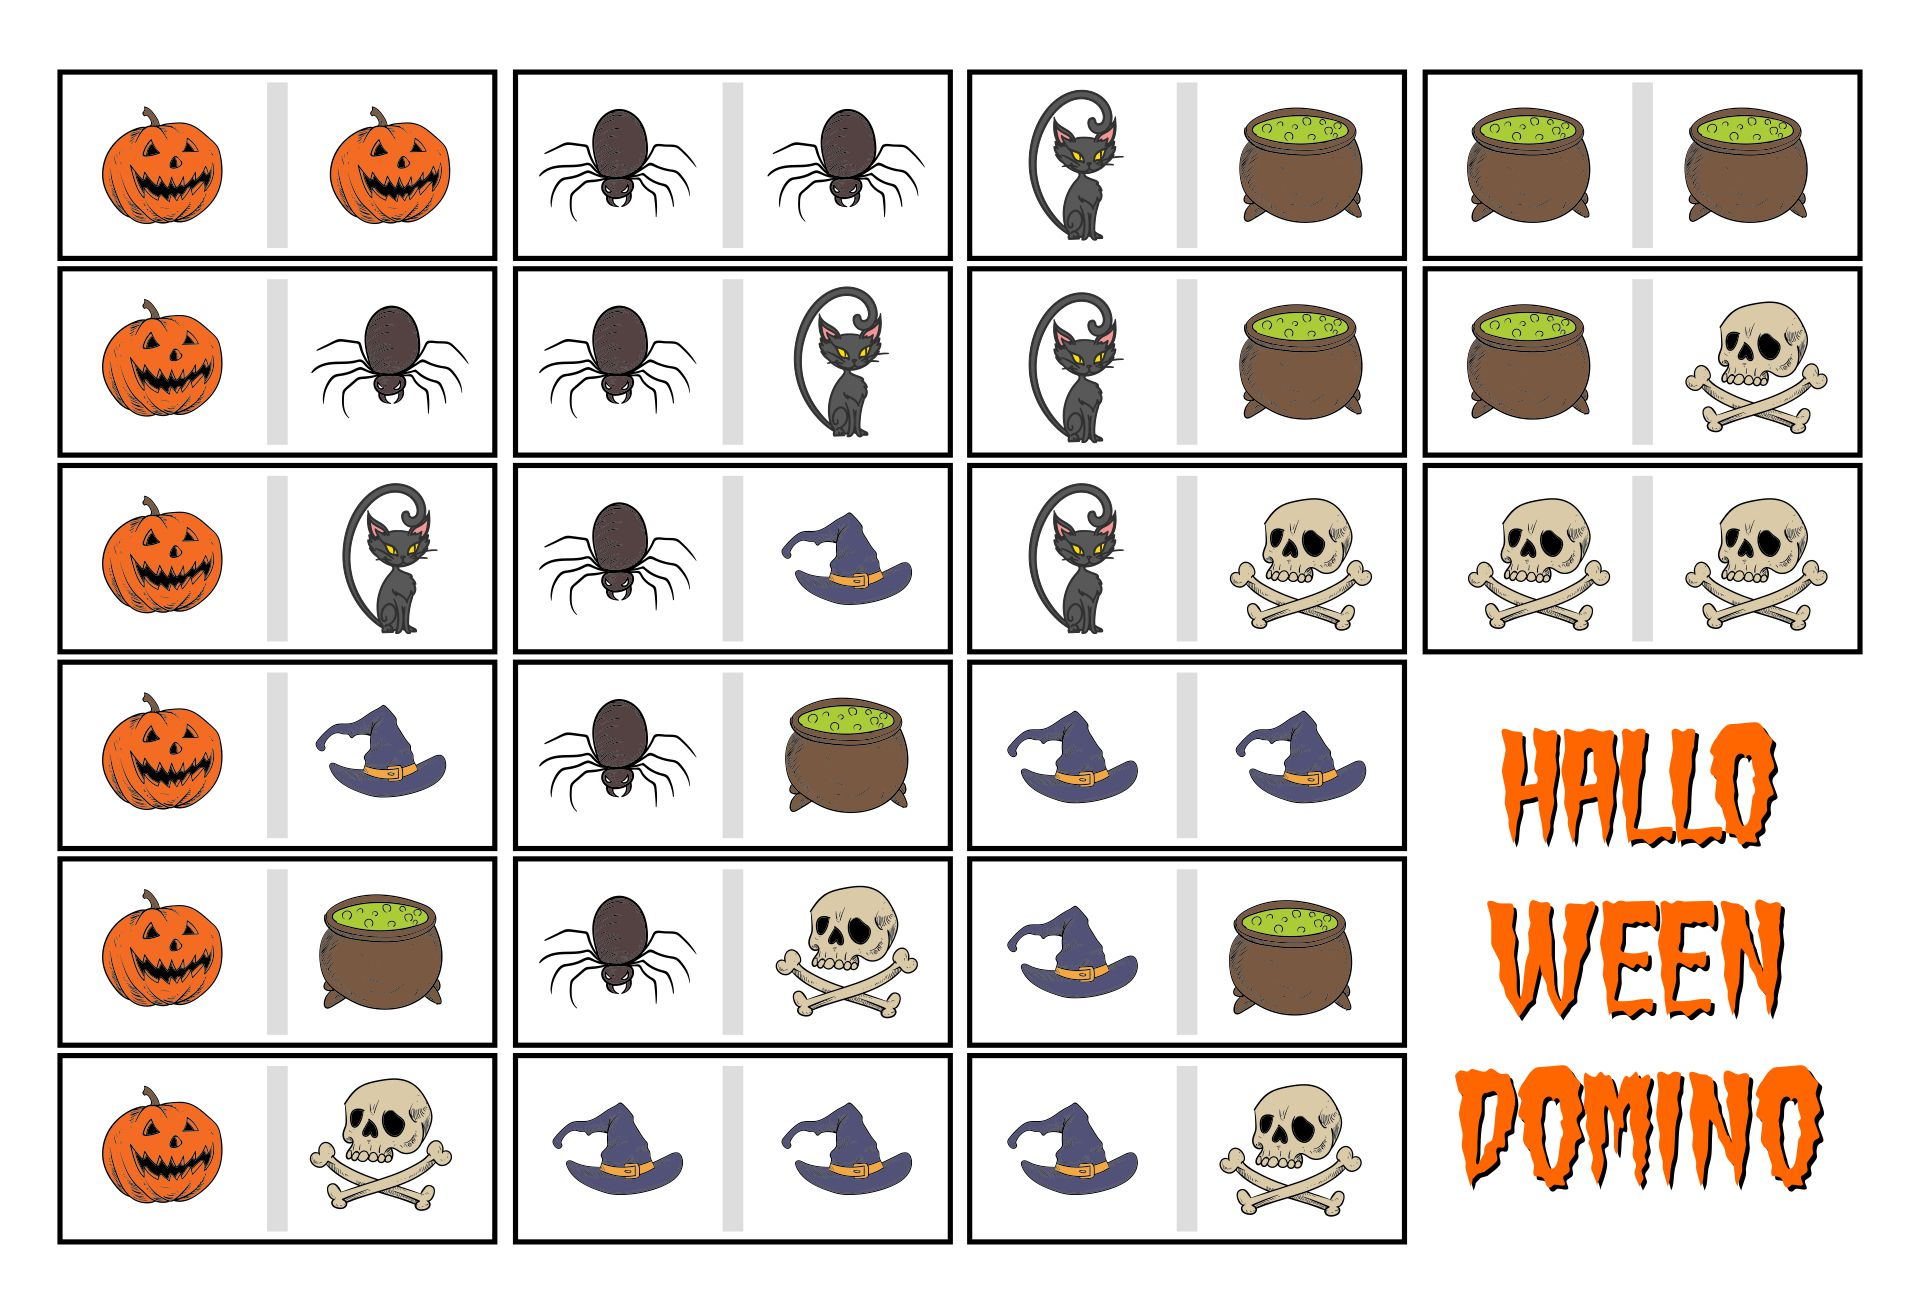 Domino Halloween Printable